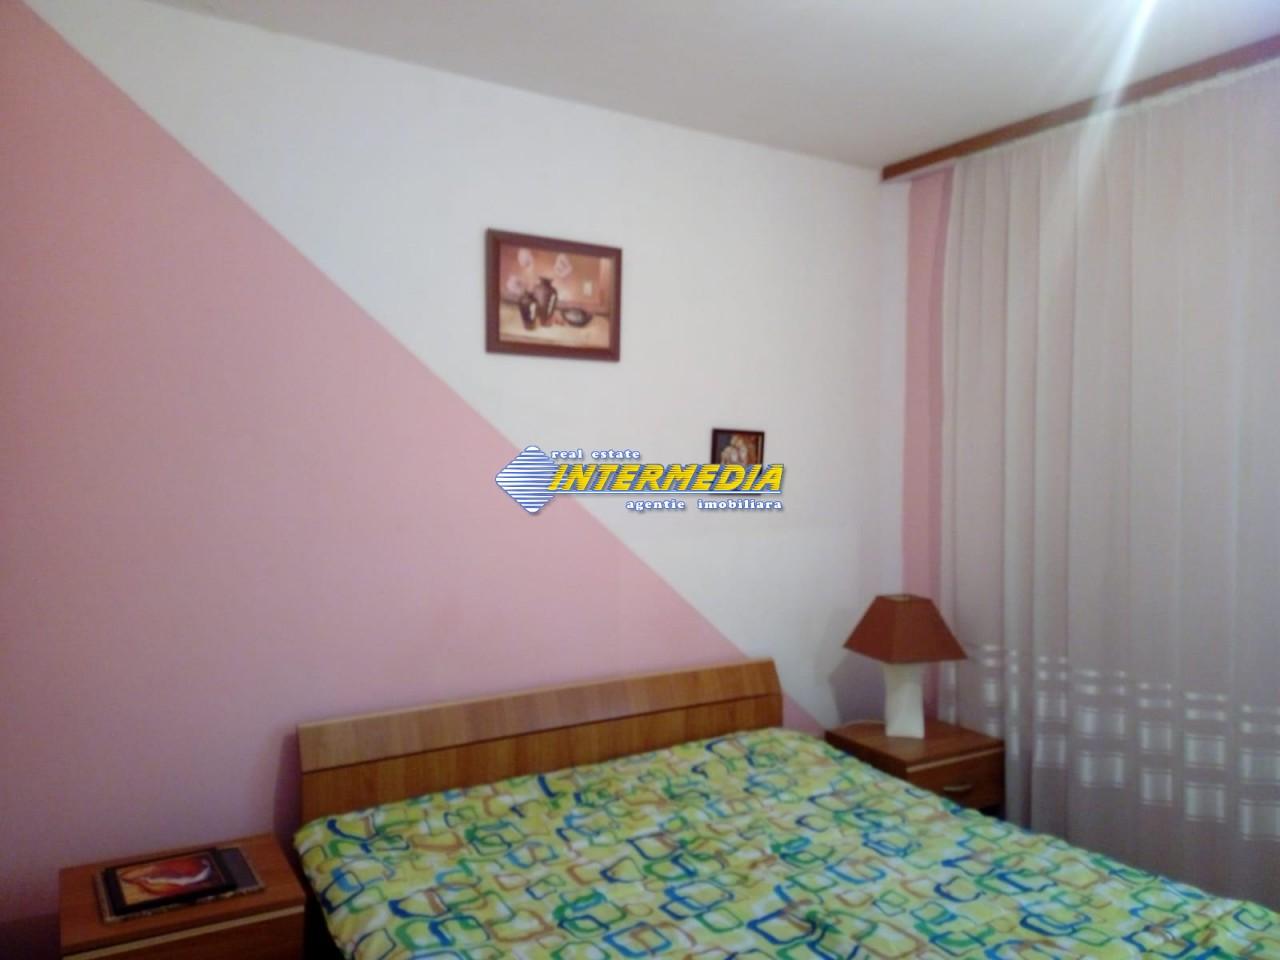 Apartament 2 camere de inchiriat in Centru Alba Iulia 250 Euro (5)_(1).jpeg